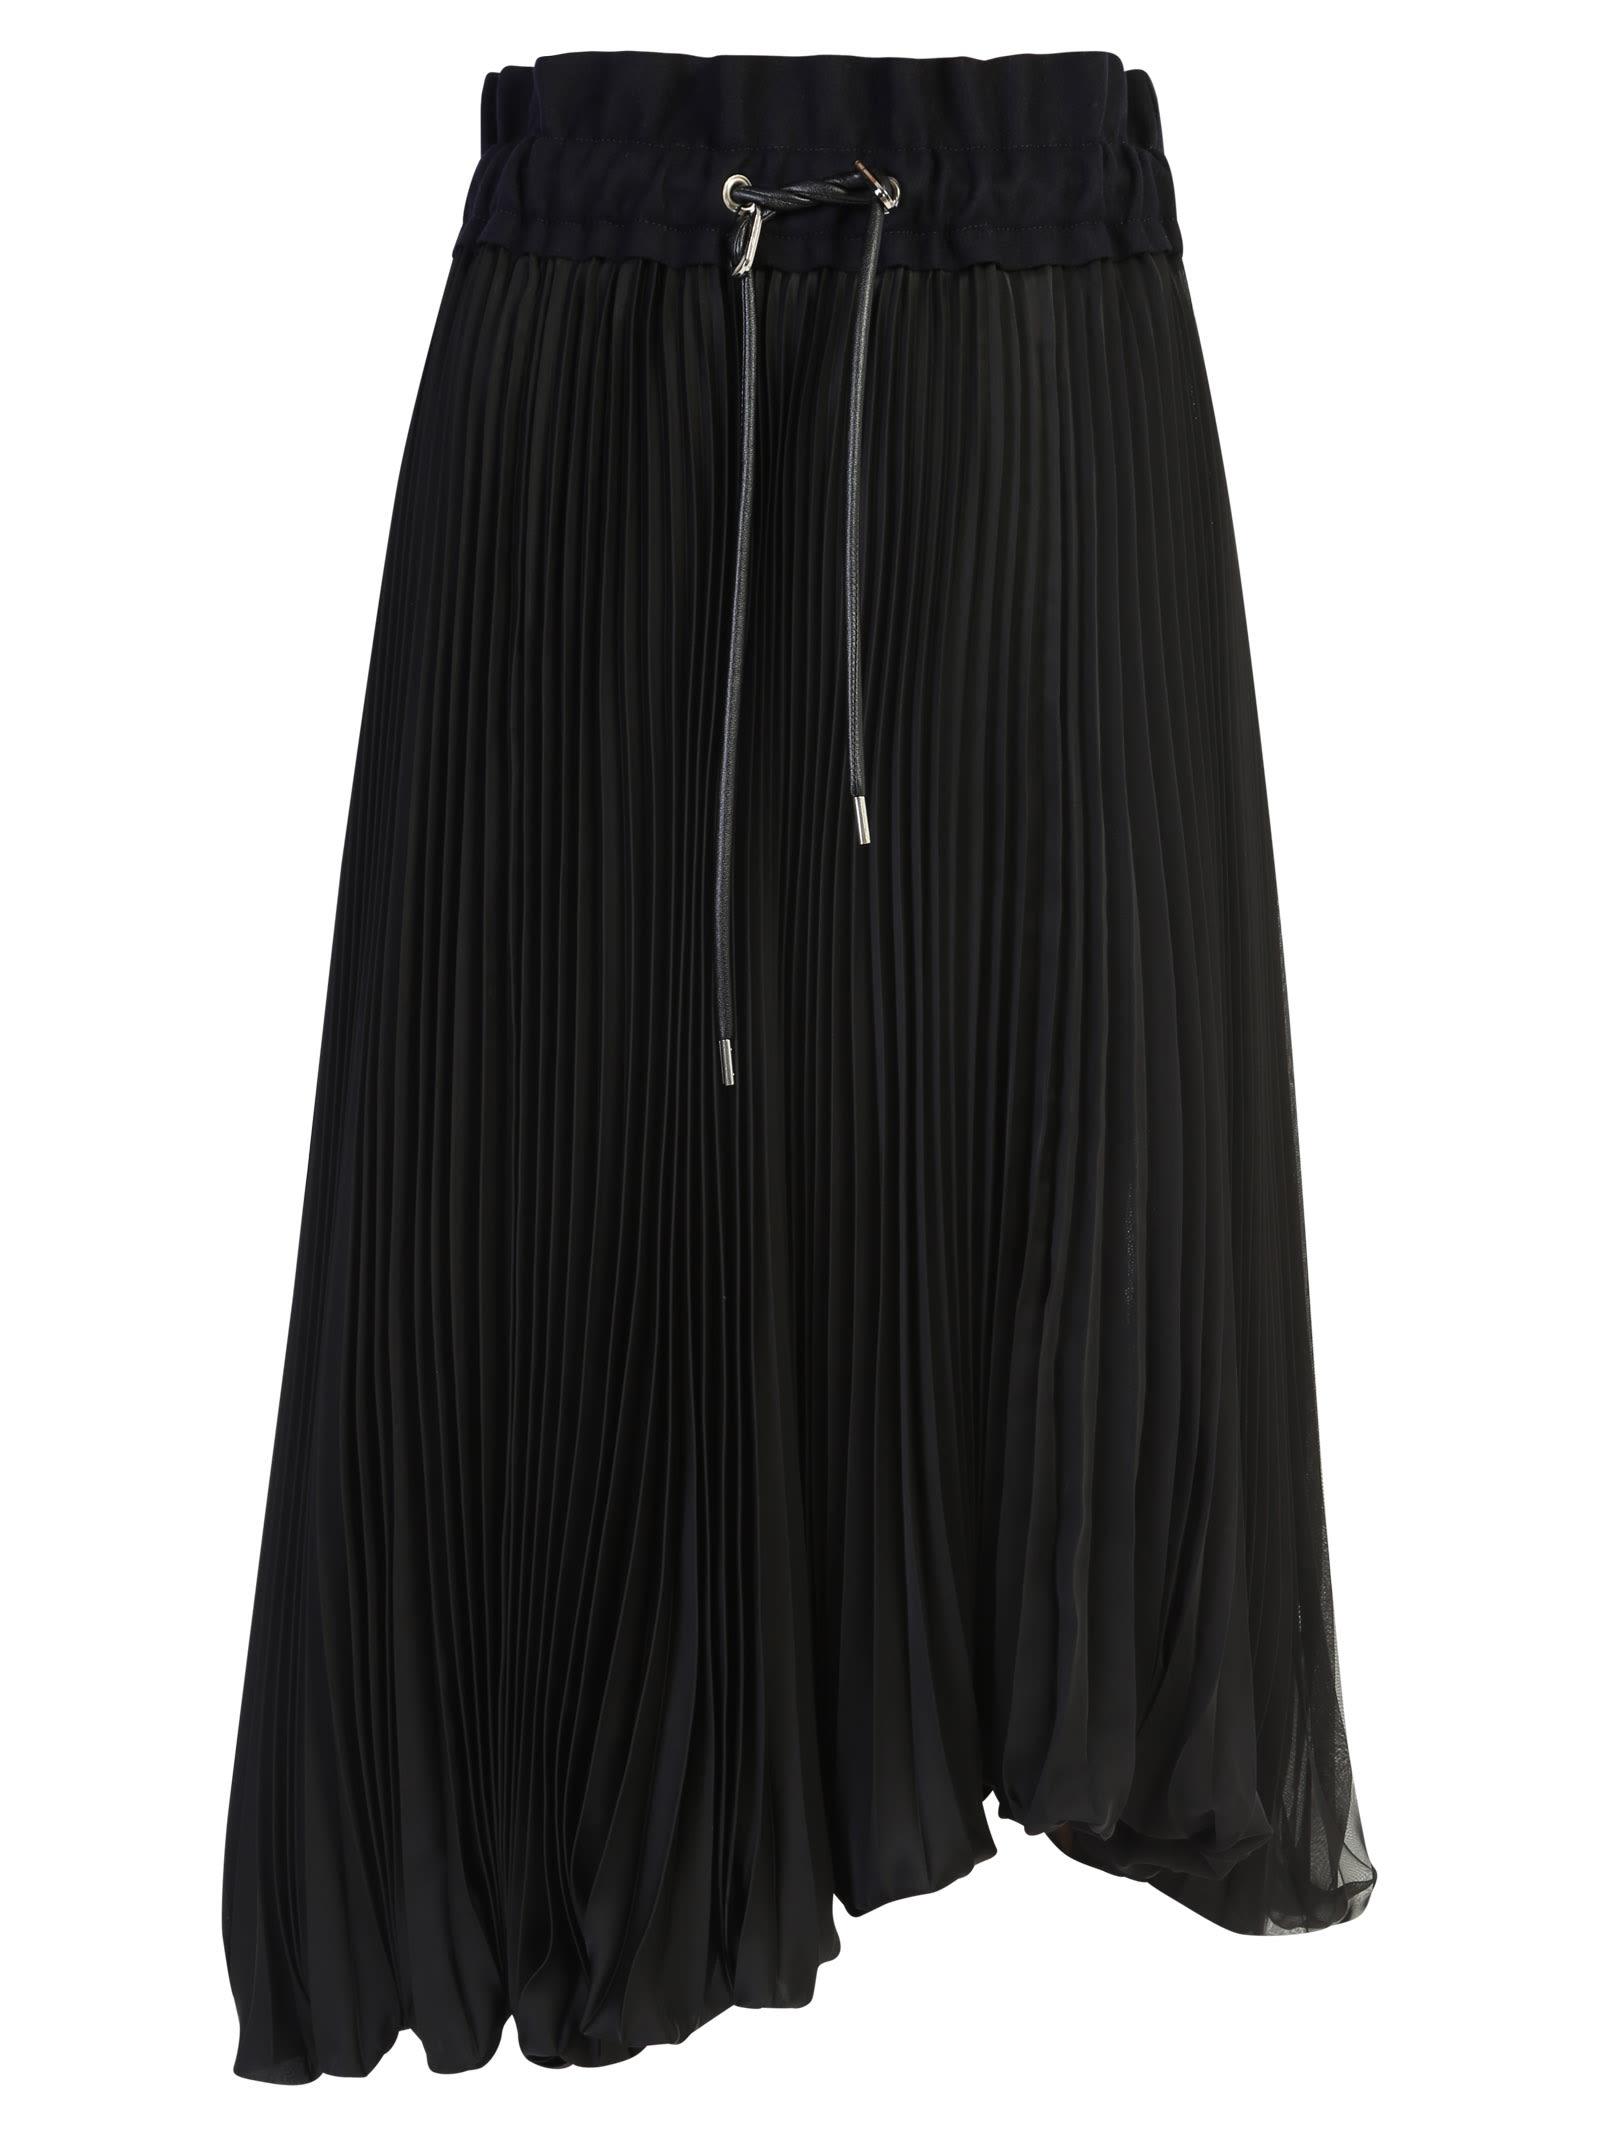 Sacai Skirts PLEATED SKIRT